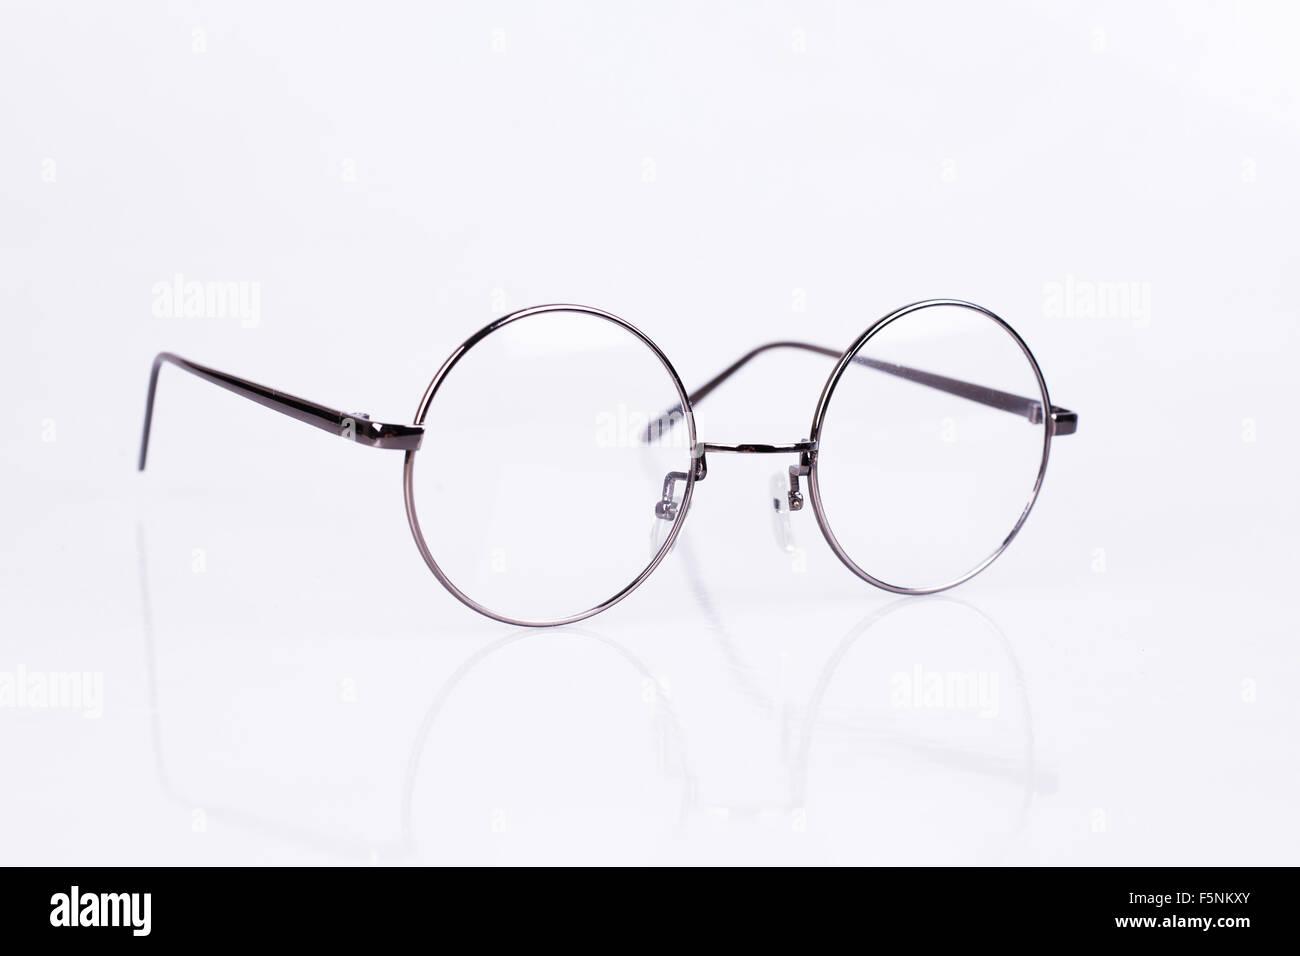 69bc25a6f0c97 Circle glasses Stock Photo  89601763 - Alamy